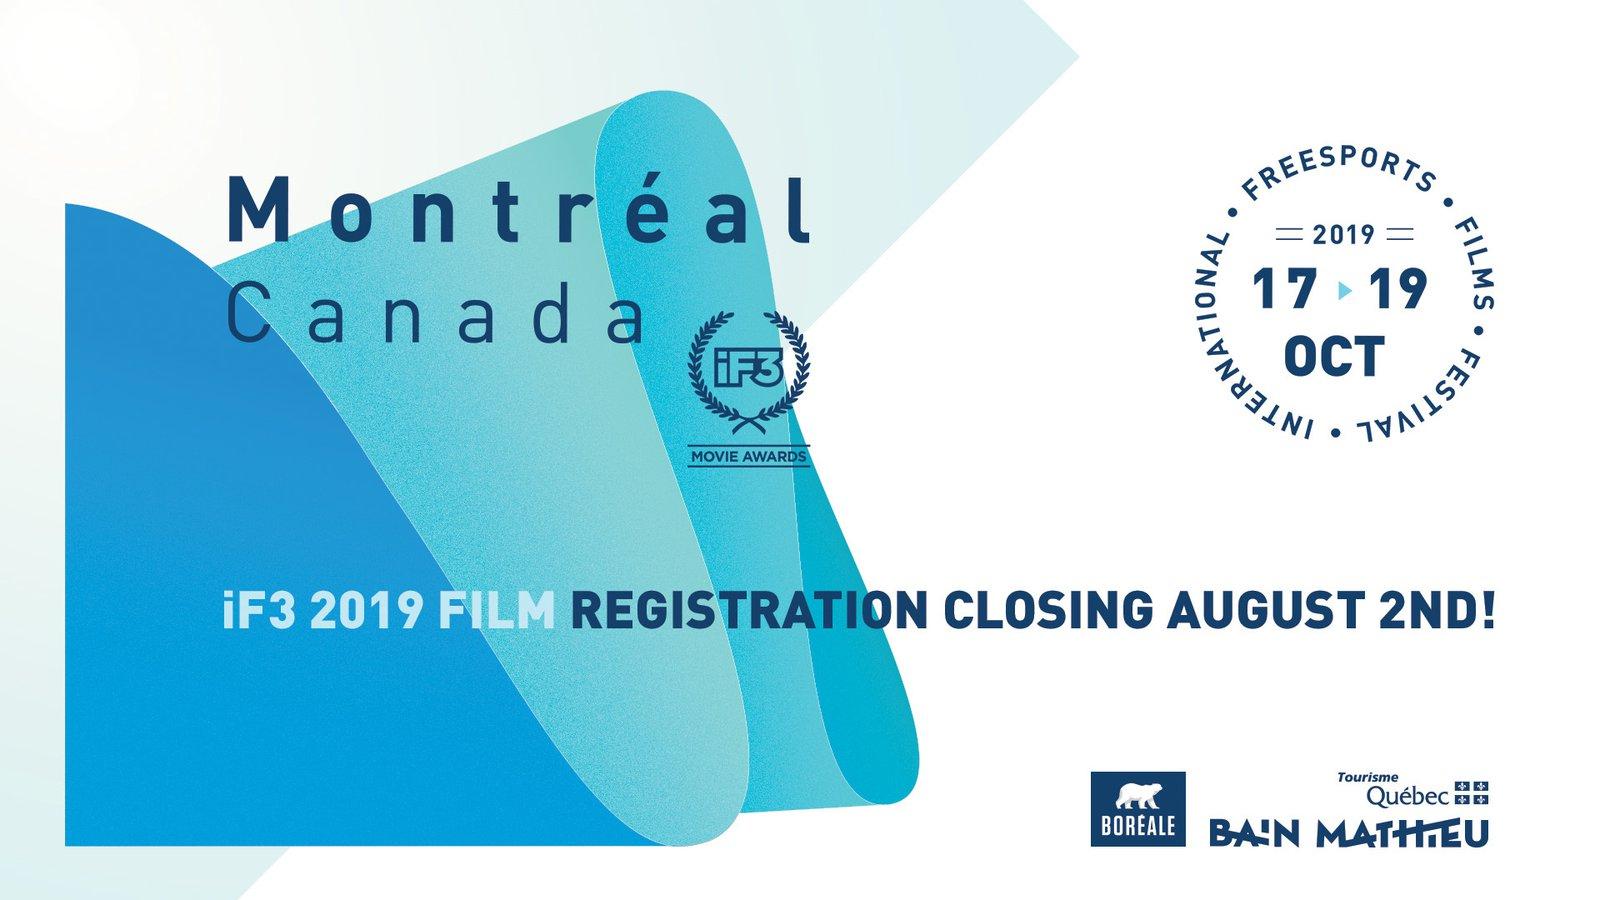 iF3 2019 Film Registration Closing date